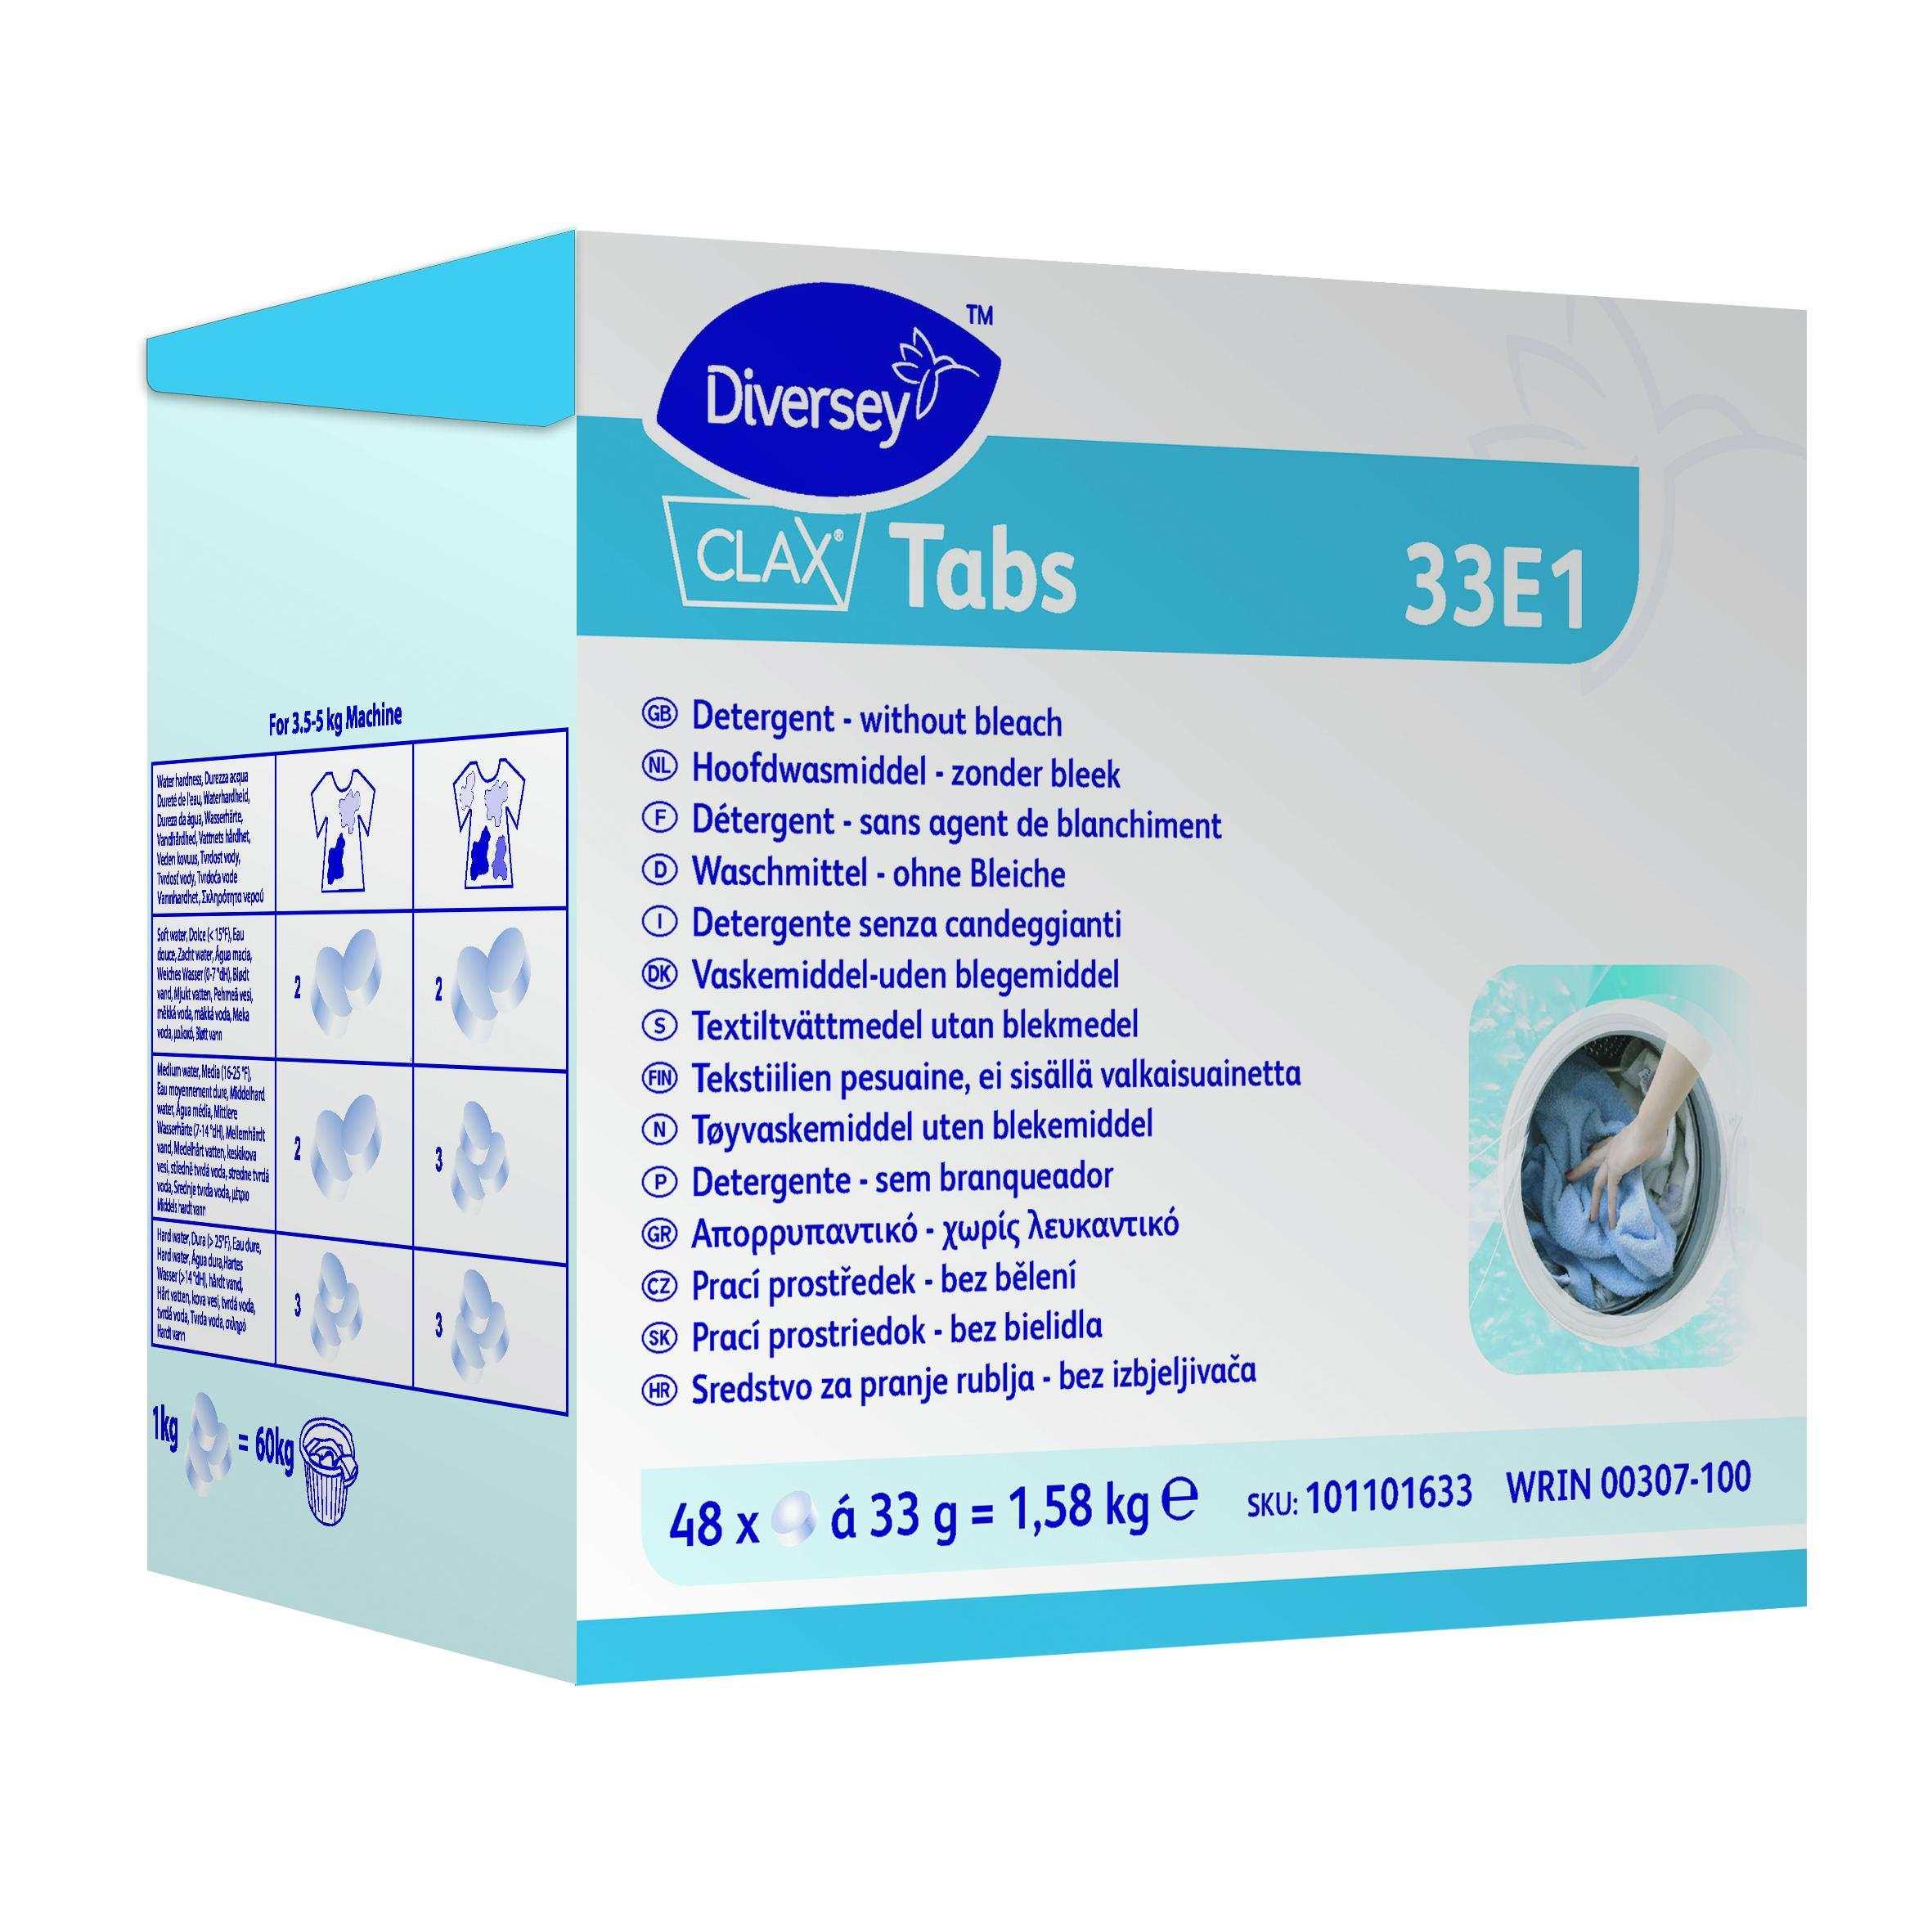 101101633-Clax-Tabs-33E1-72pc-CMYK-20x20cm.jpg